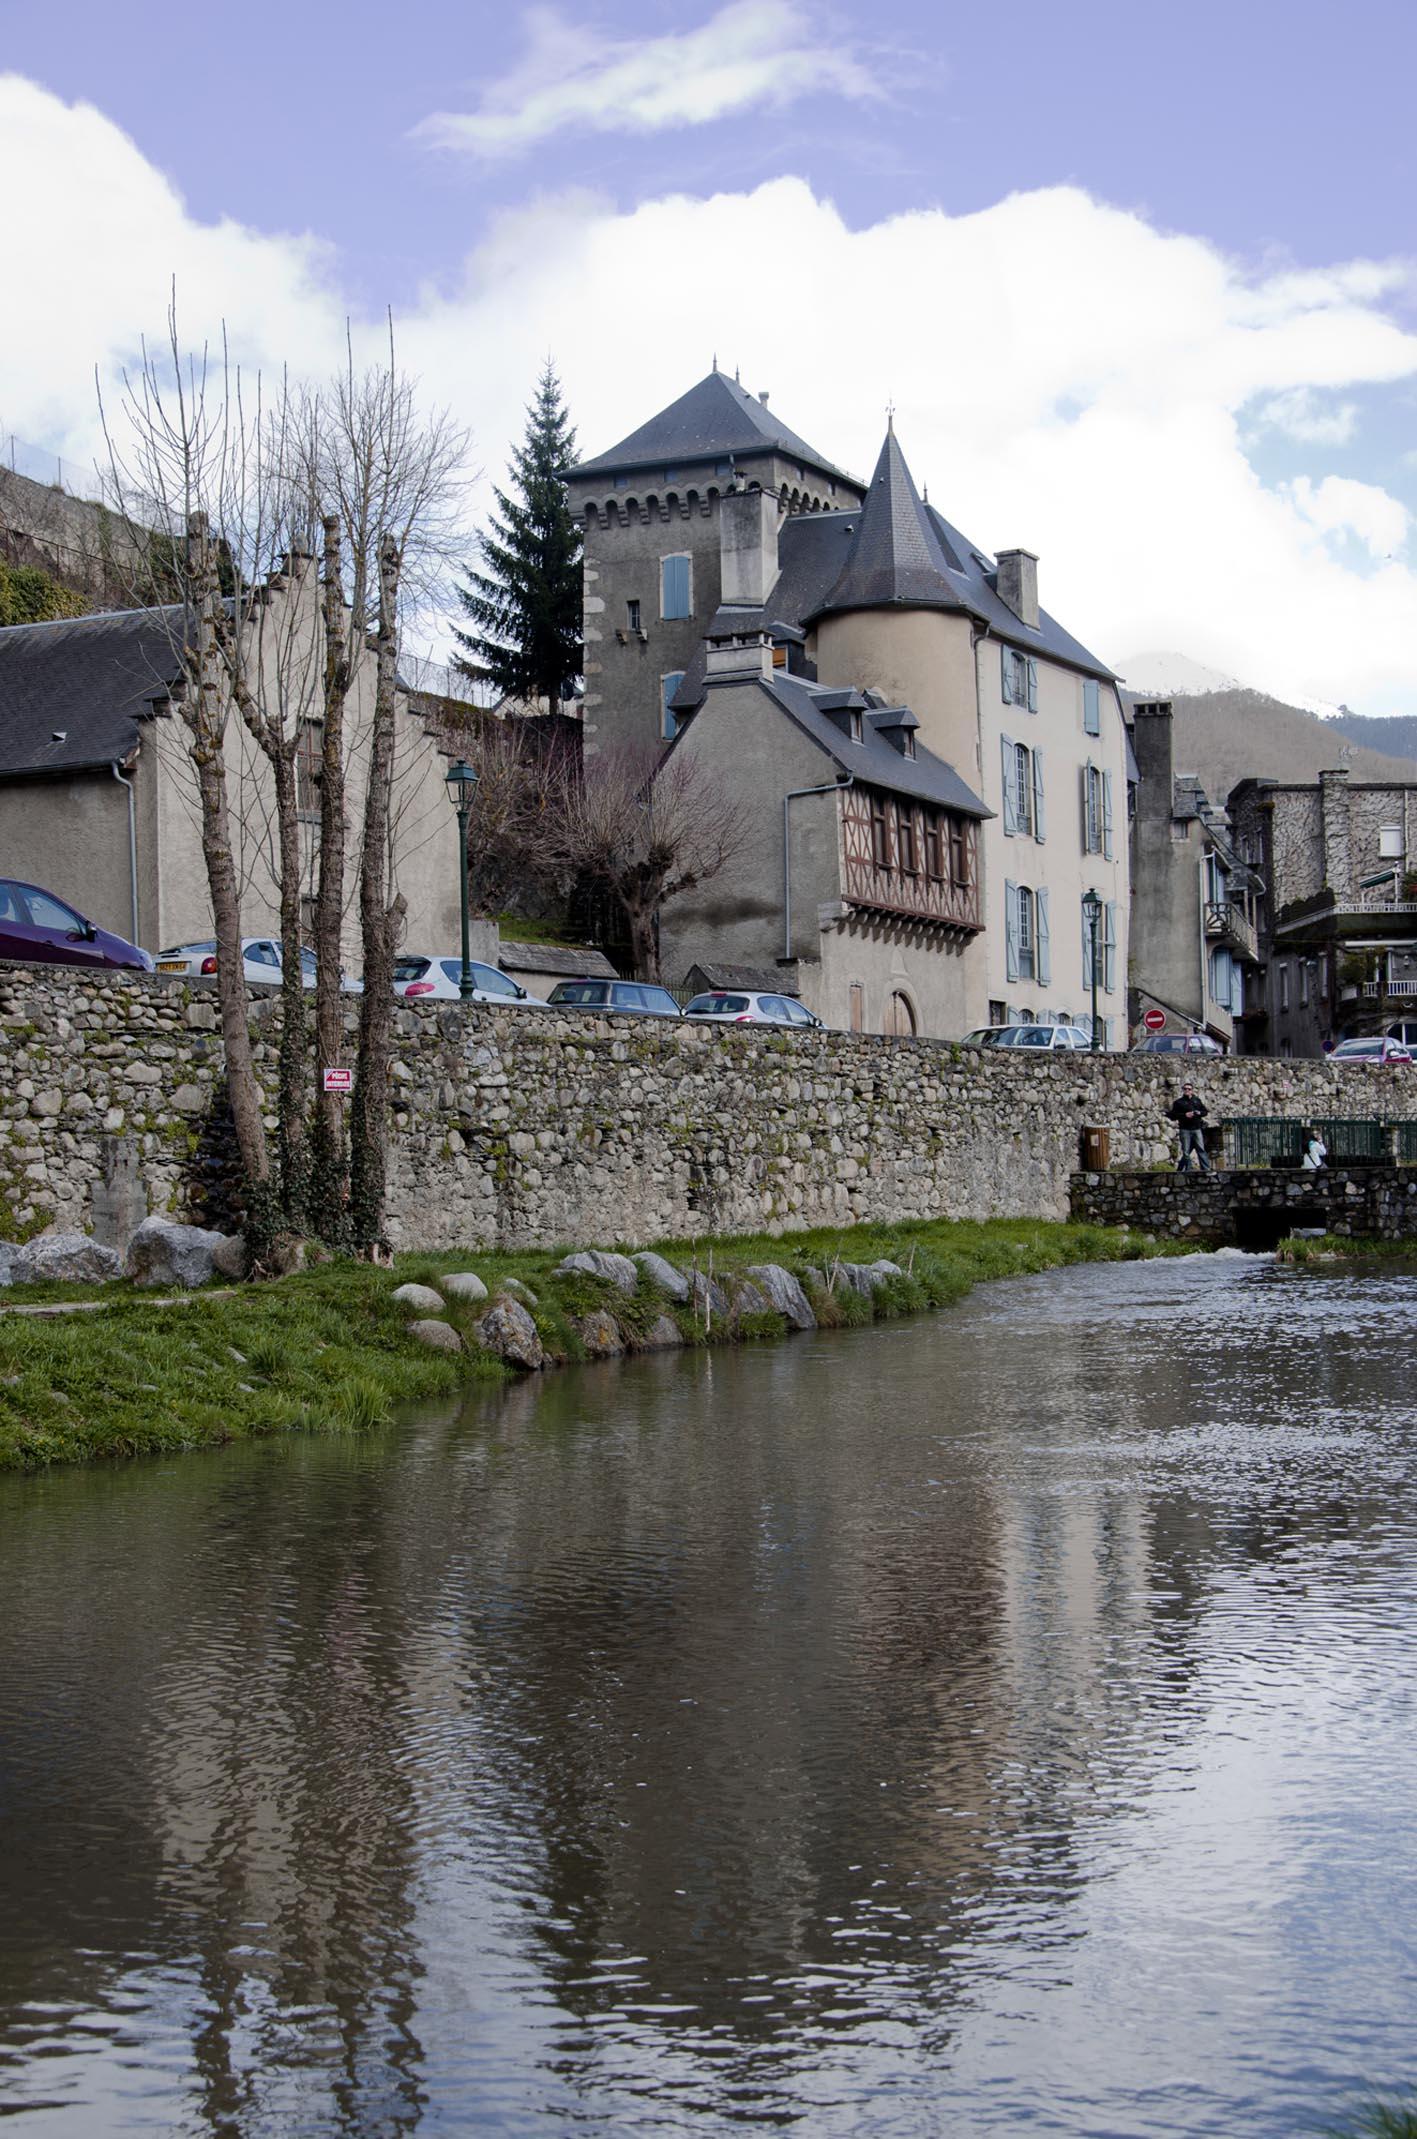 Paseando por Arreau, Francia